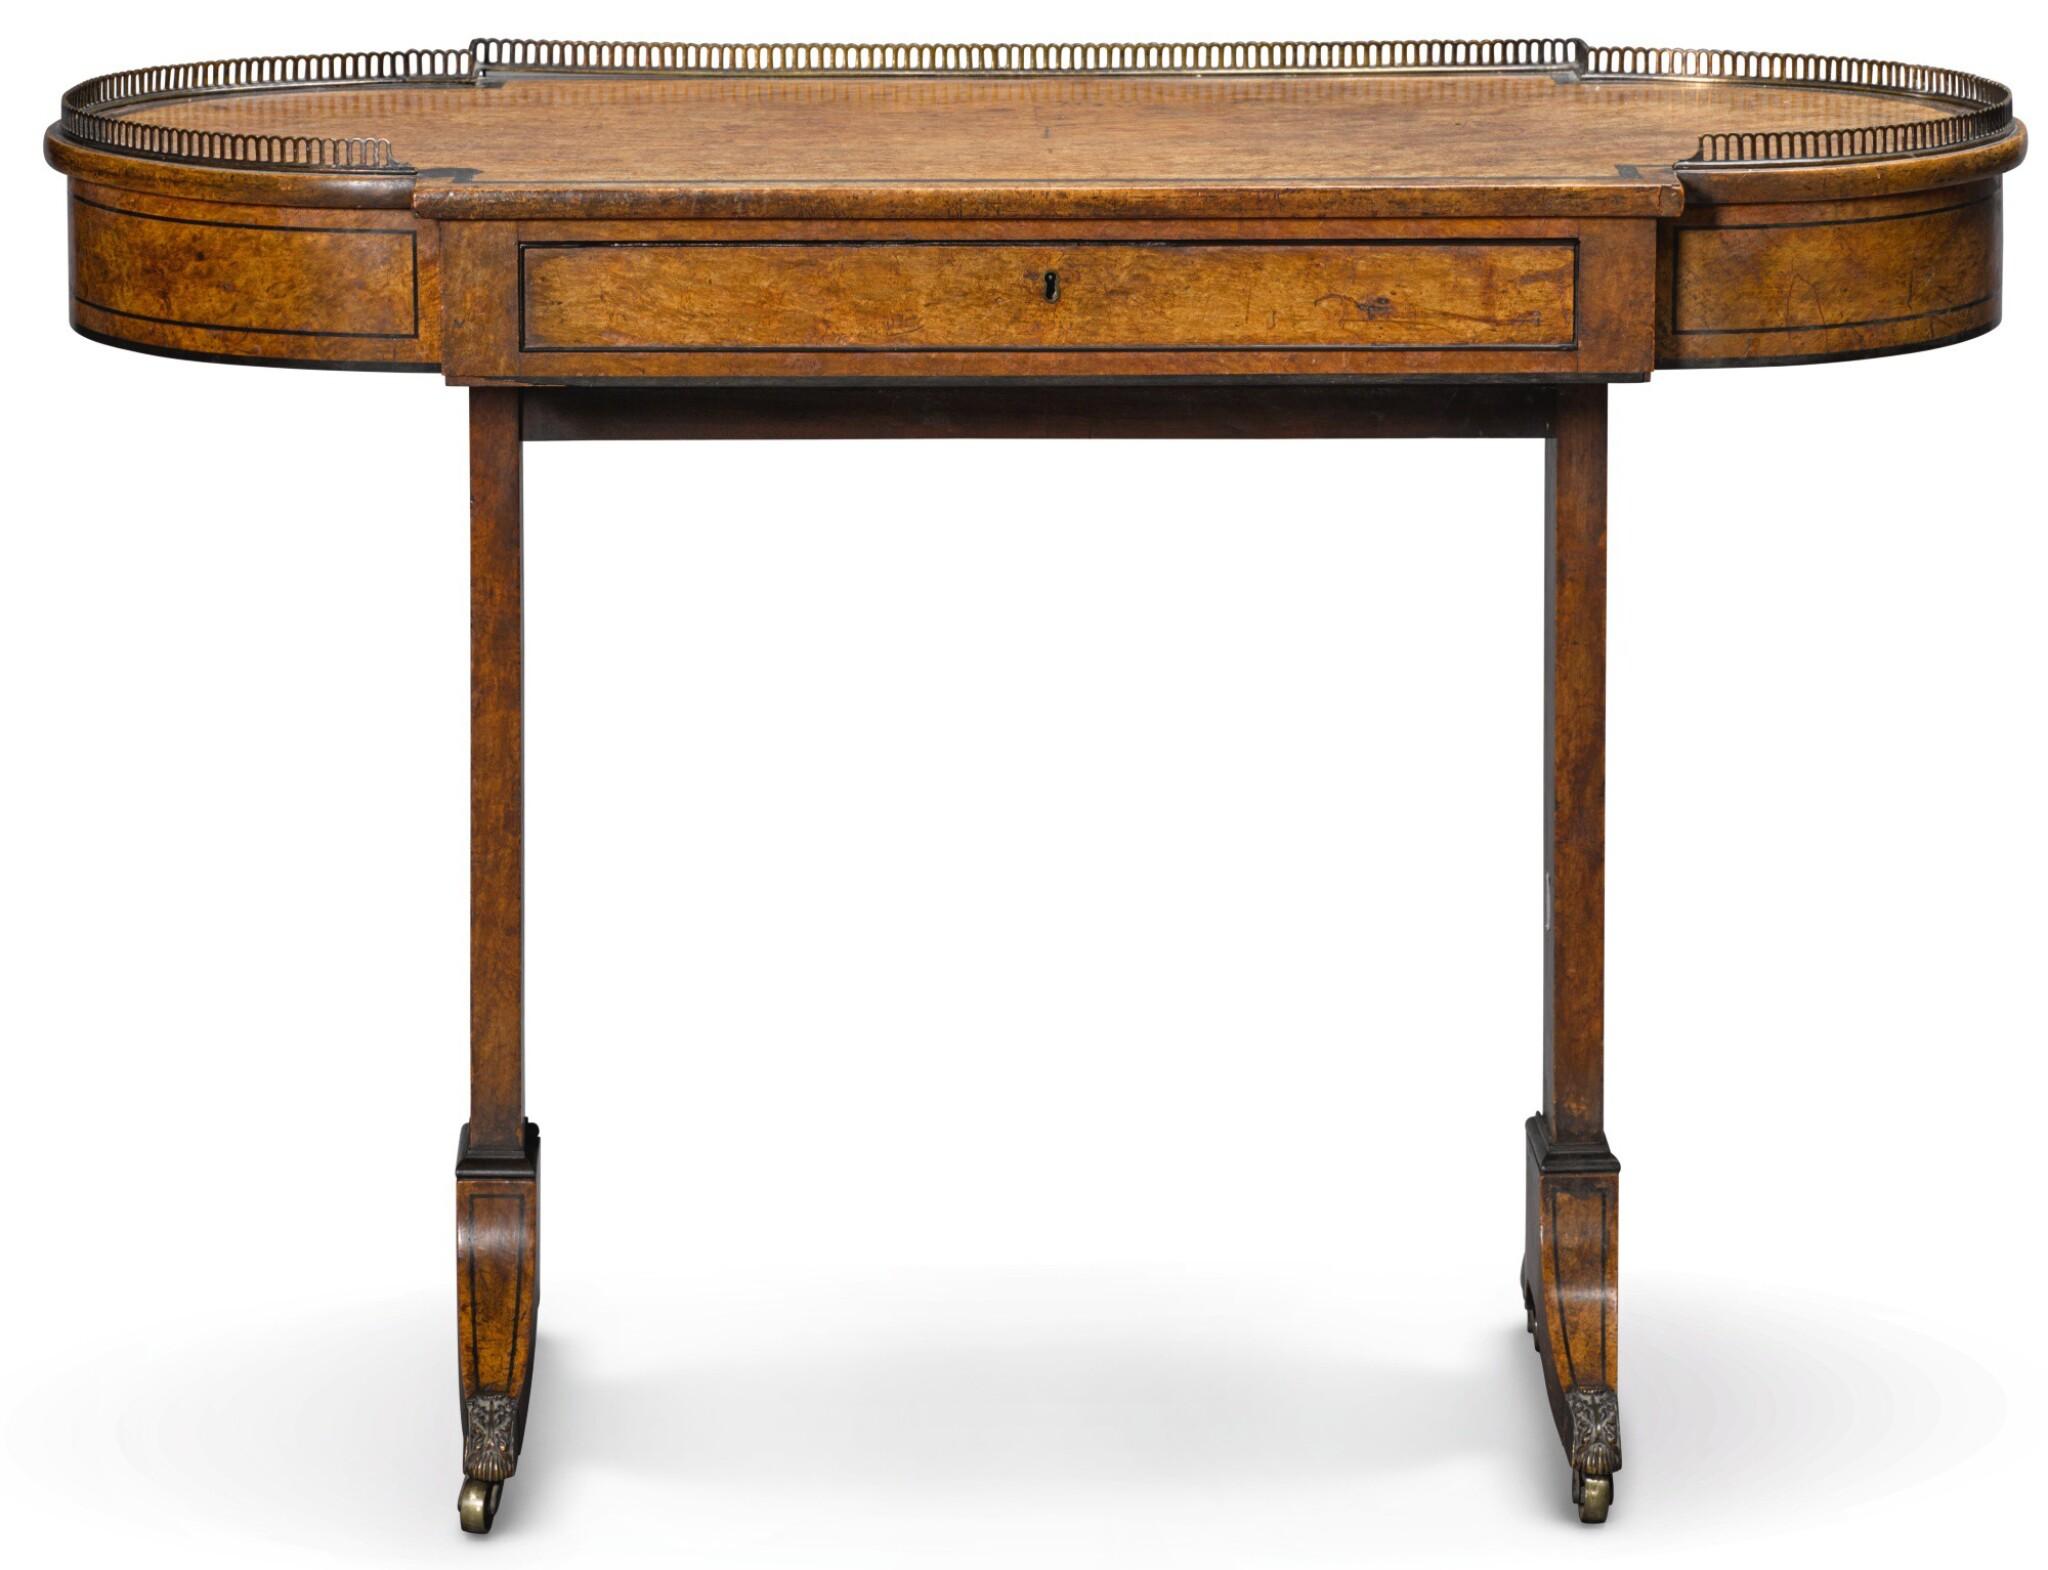 A REGENCY EBONY STRUNG BURR ELM WRITING TABLE, CIRCA 1820